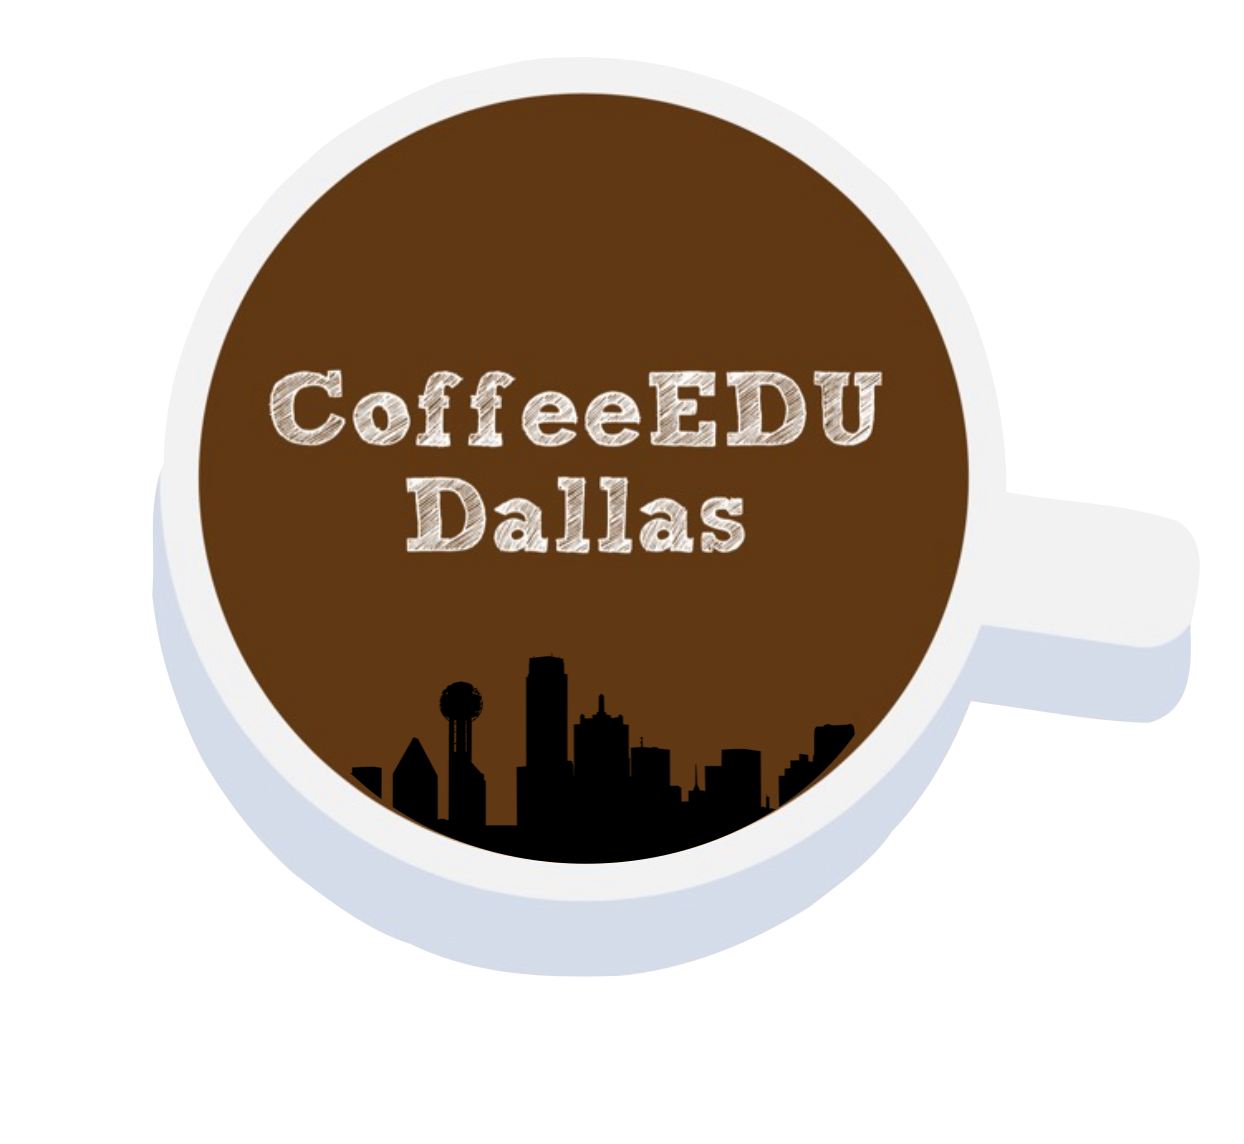 https://www.meetup.com/CoffeeEDU